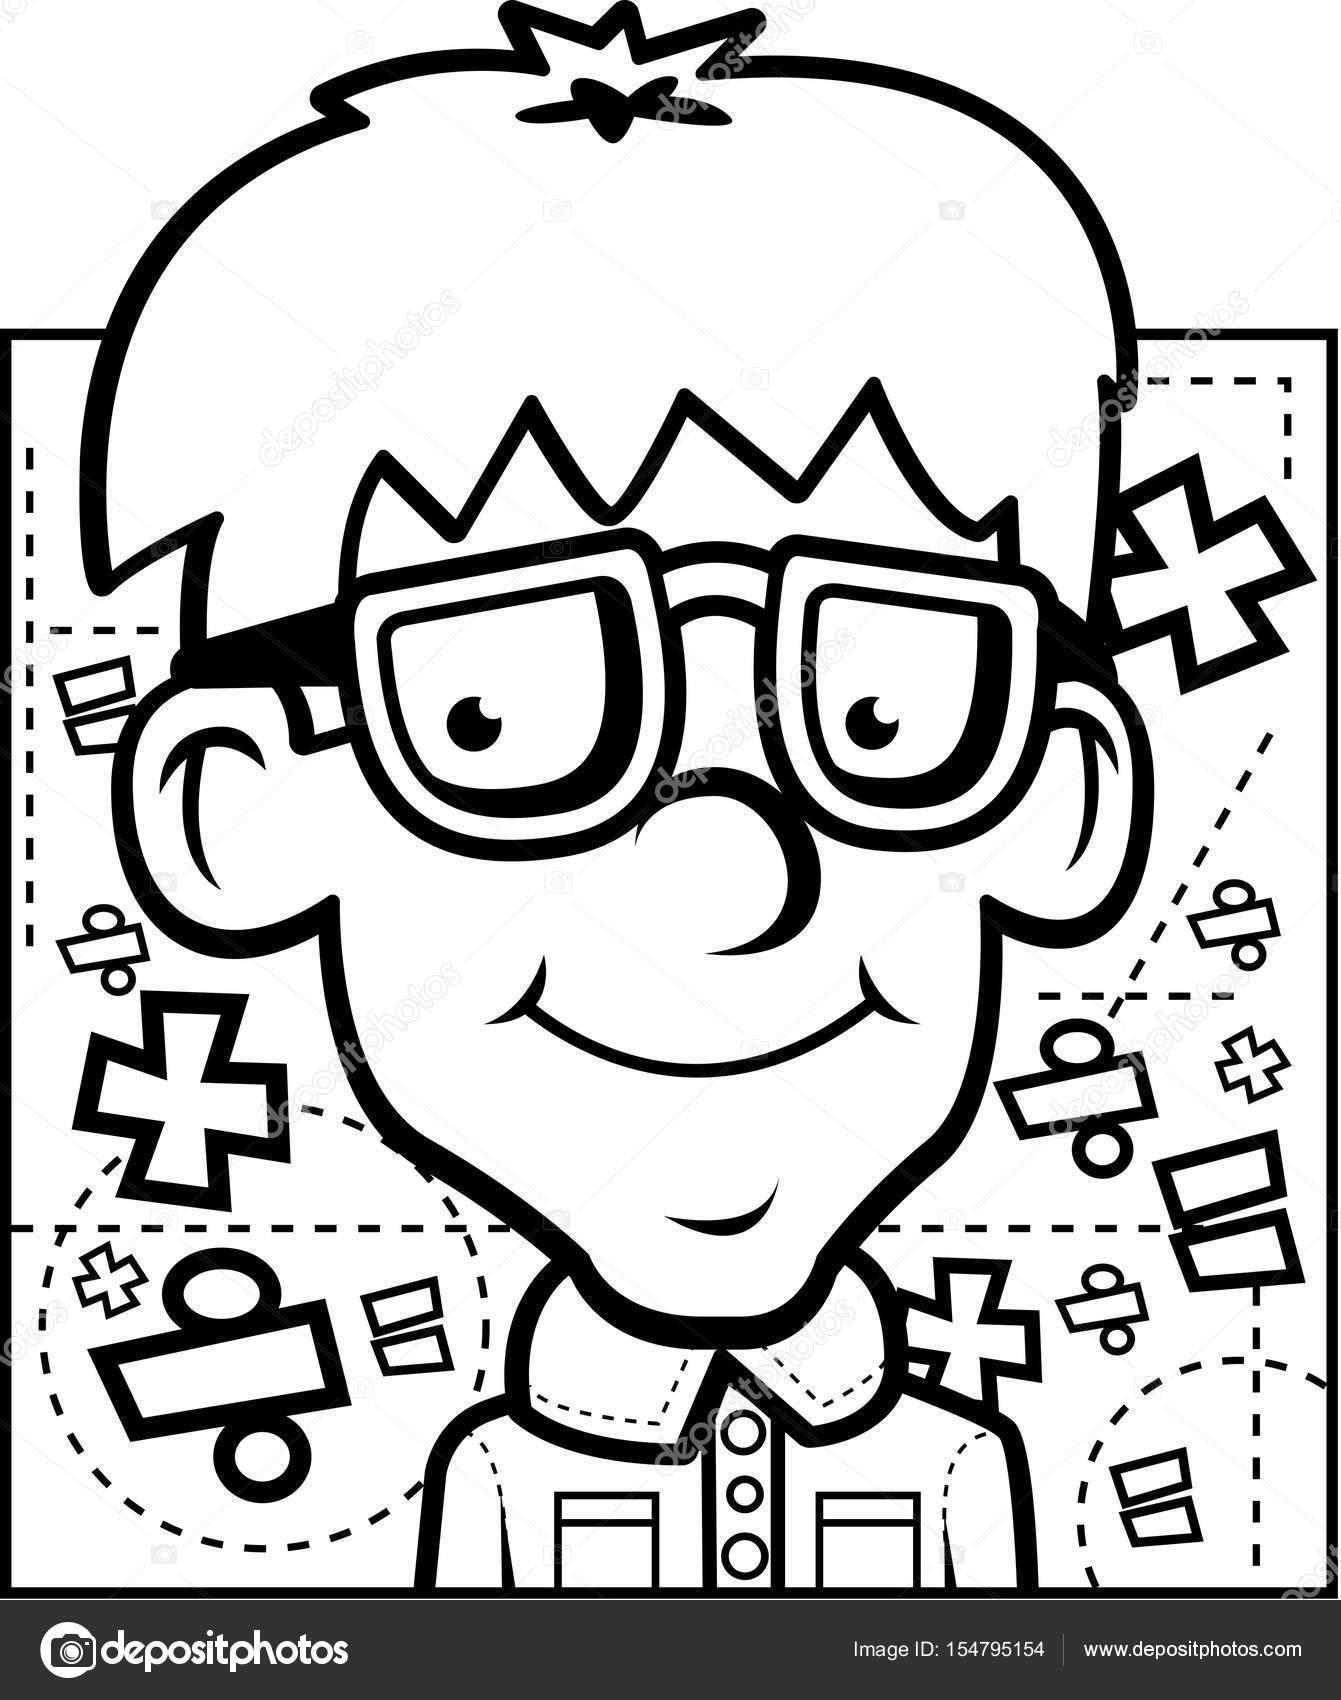 dibujos animados matem u00e1ticas nerd archivo im u00e1genes vectoriales  u00a9 cthoman 154795154 math clip art for kids black and white Math Symbols Clip Art